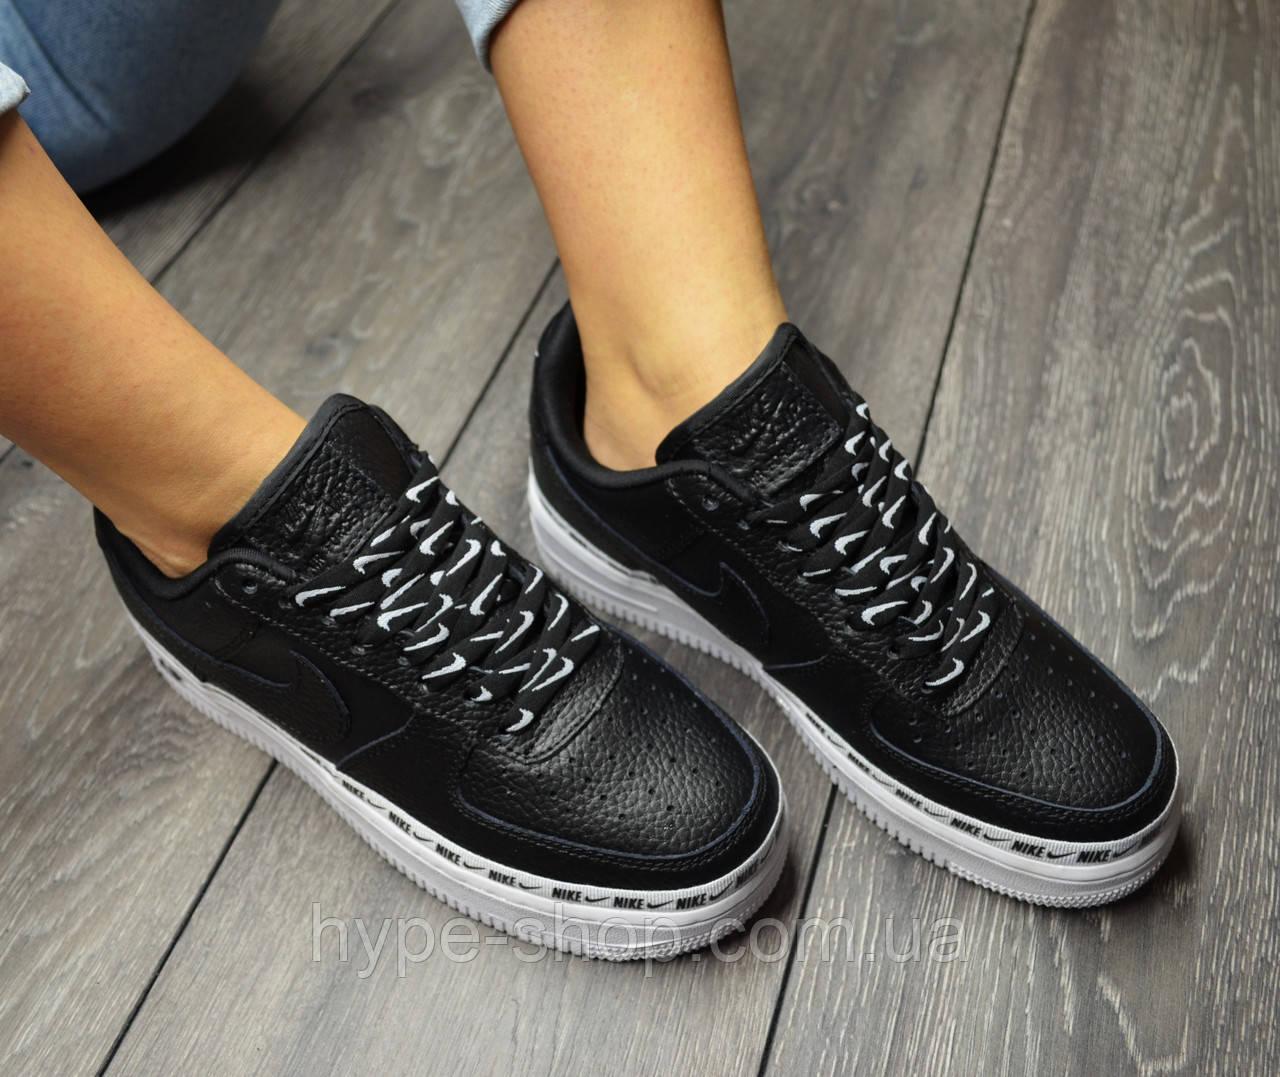 Жіночі Nike Air Force 1 Low Black Ribbon Pack